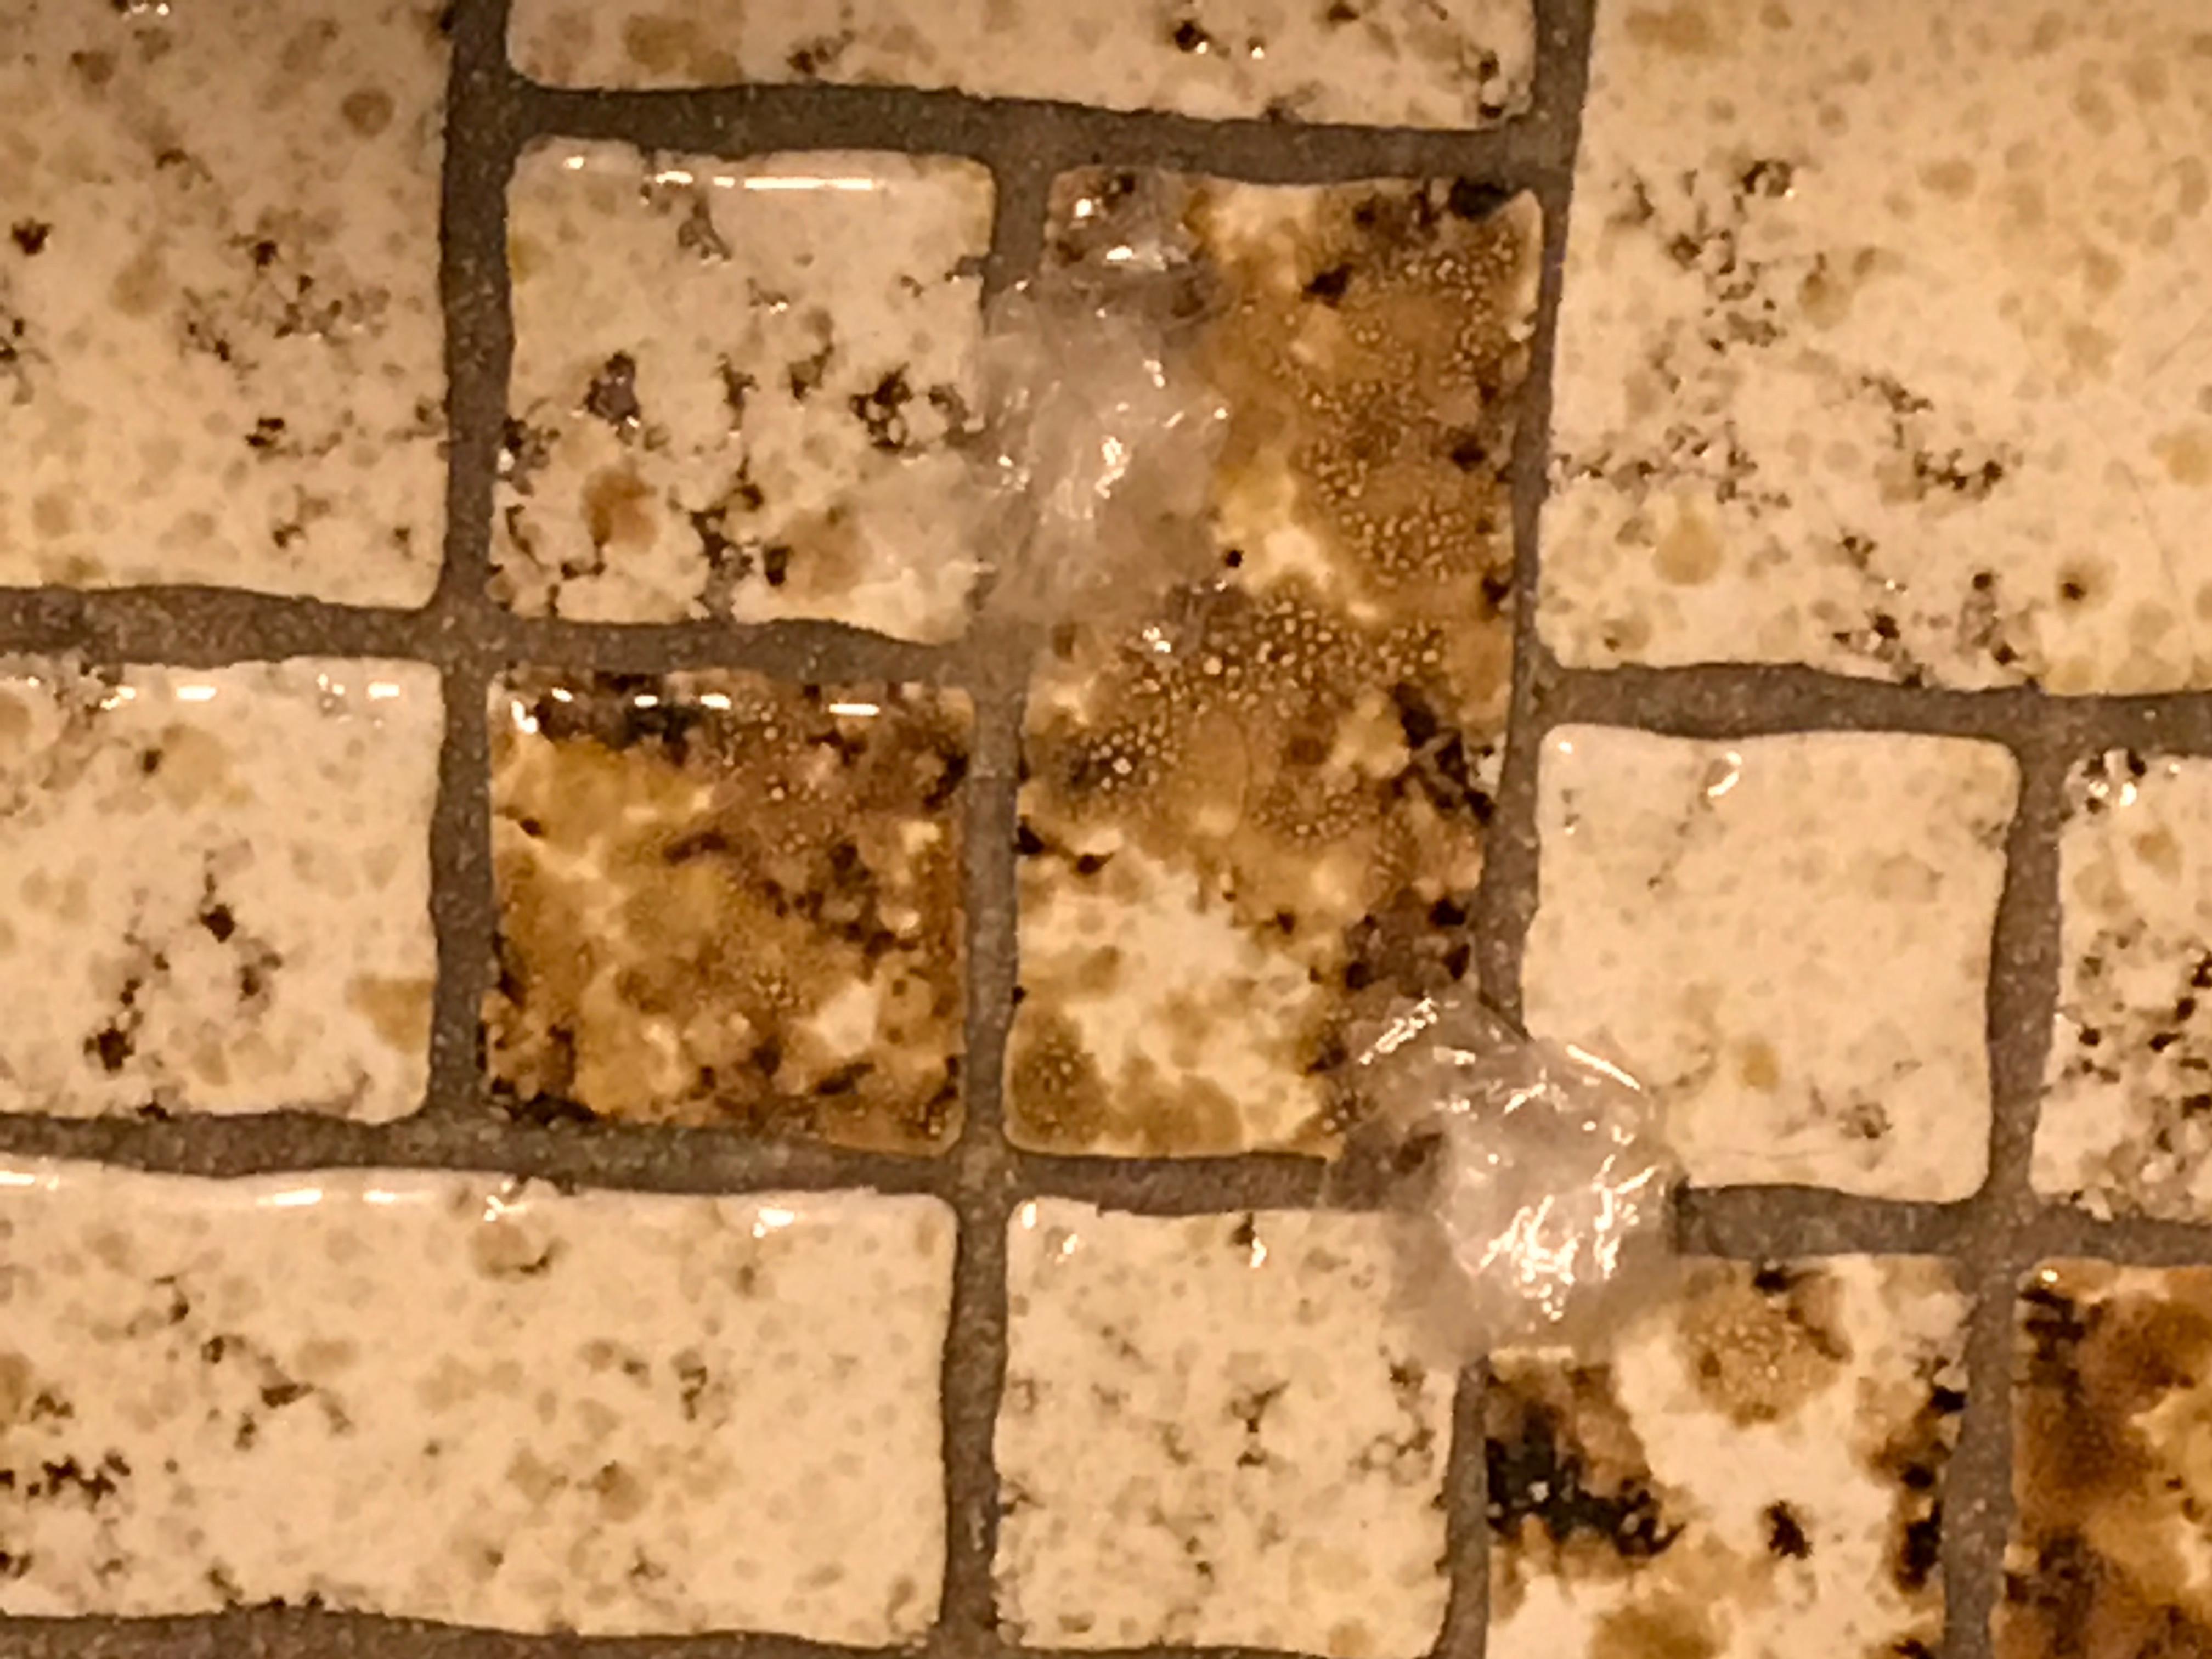 Little baggies- appear drug bags